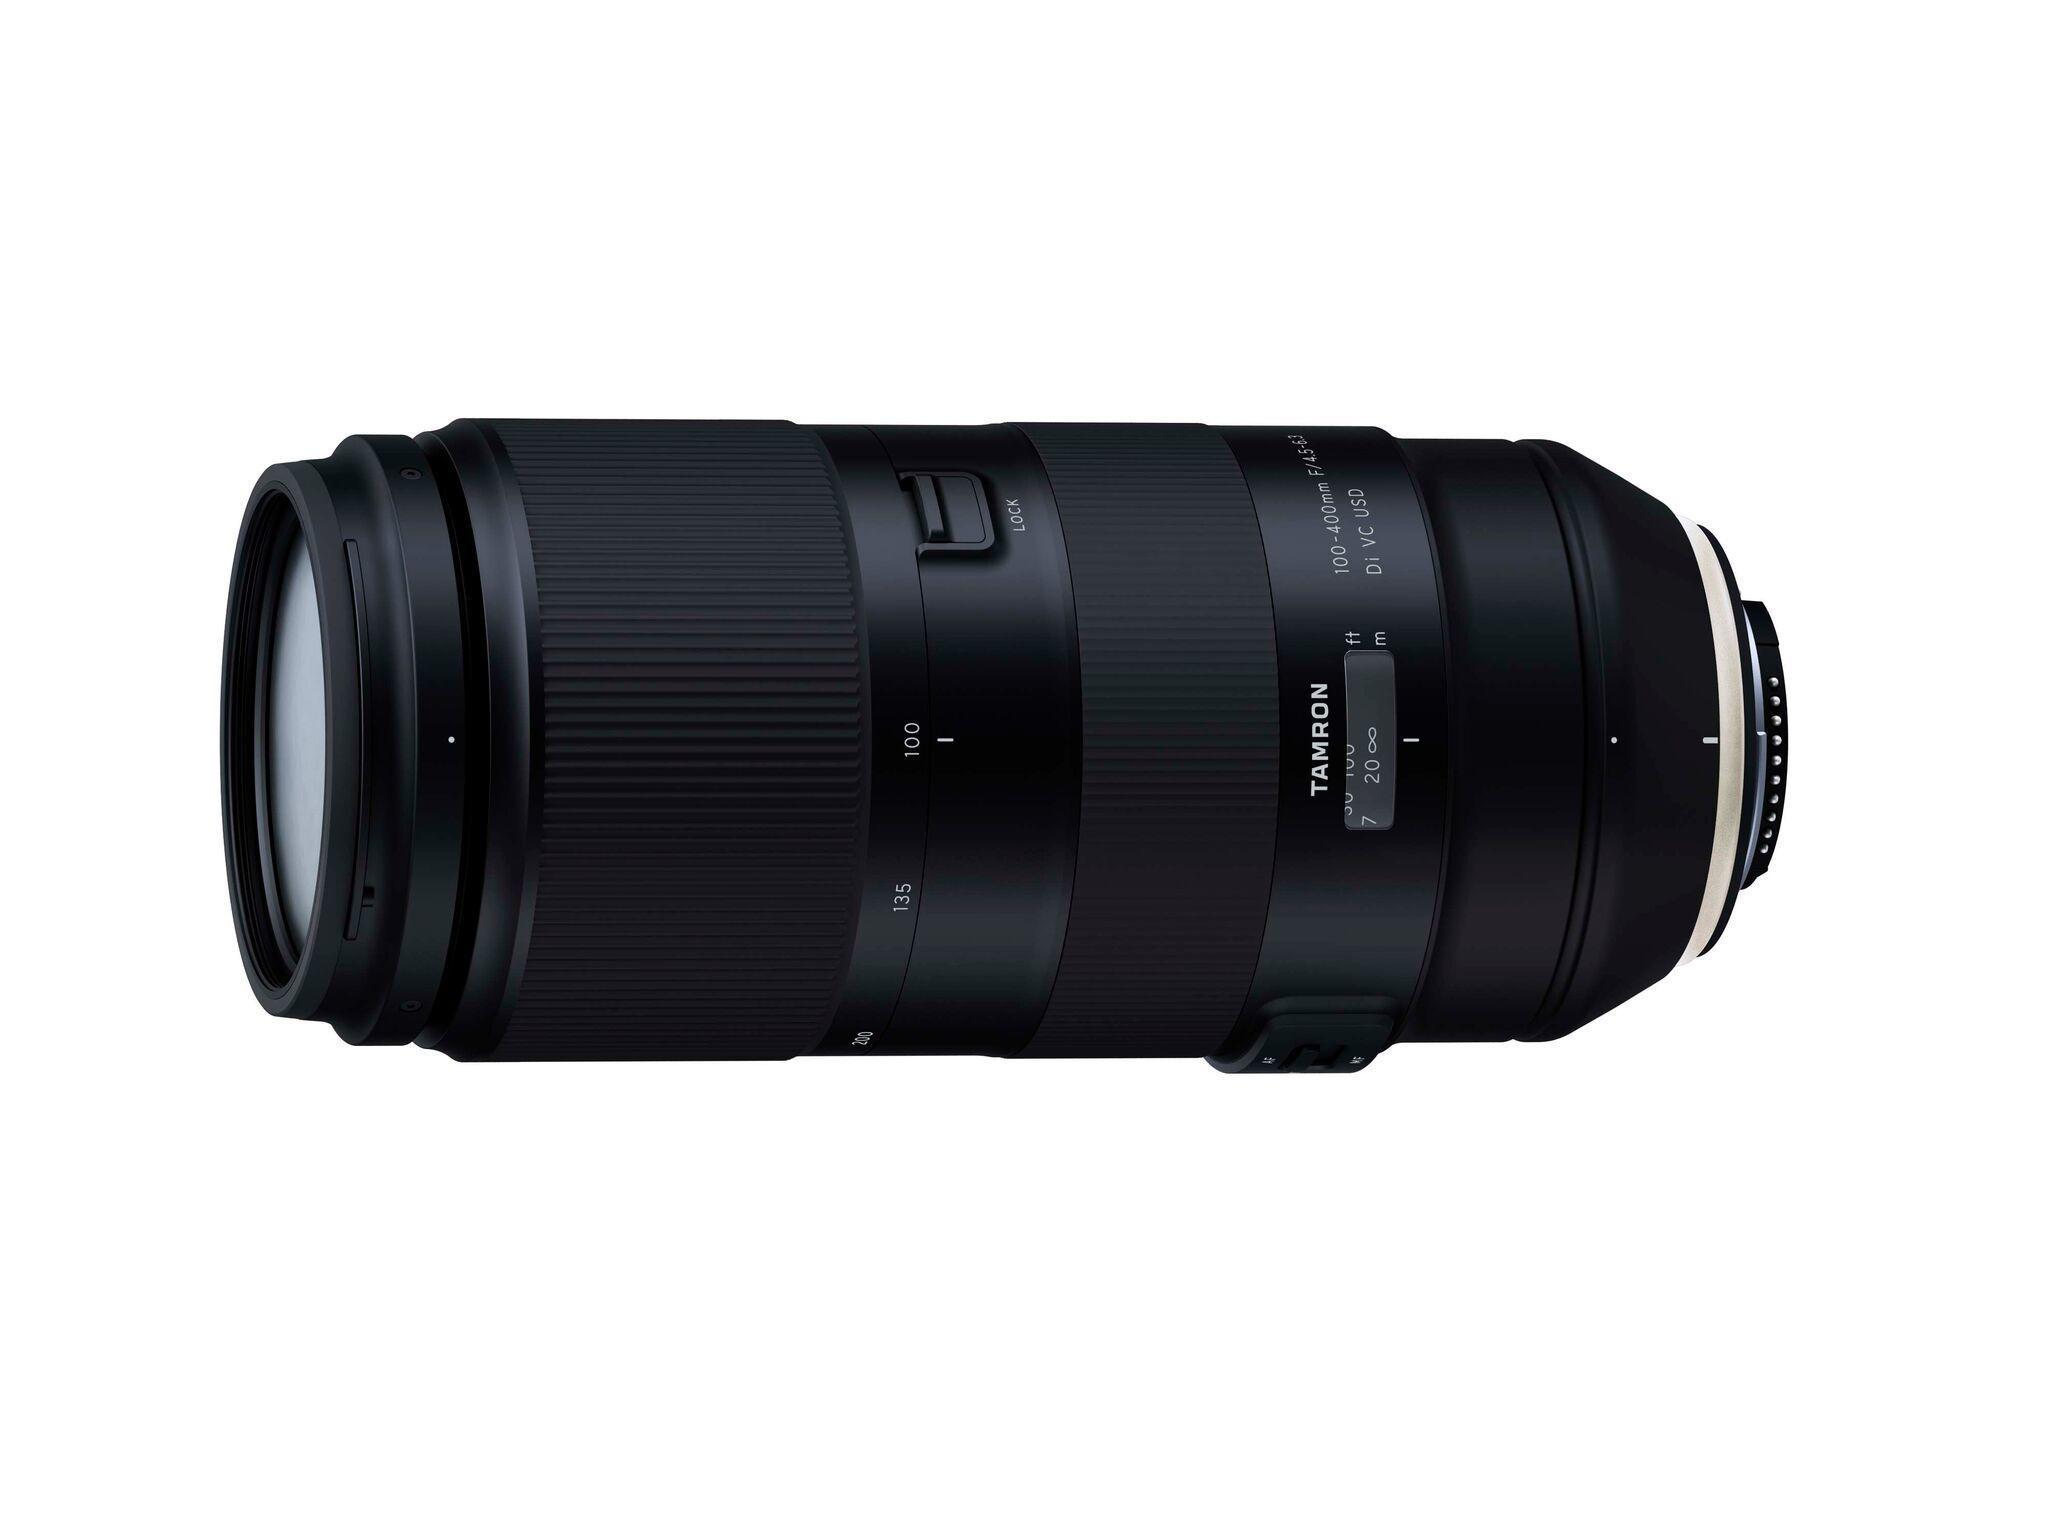 Téléobjectif 100-400mm VC USD Nikon